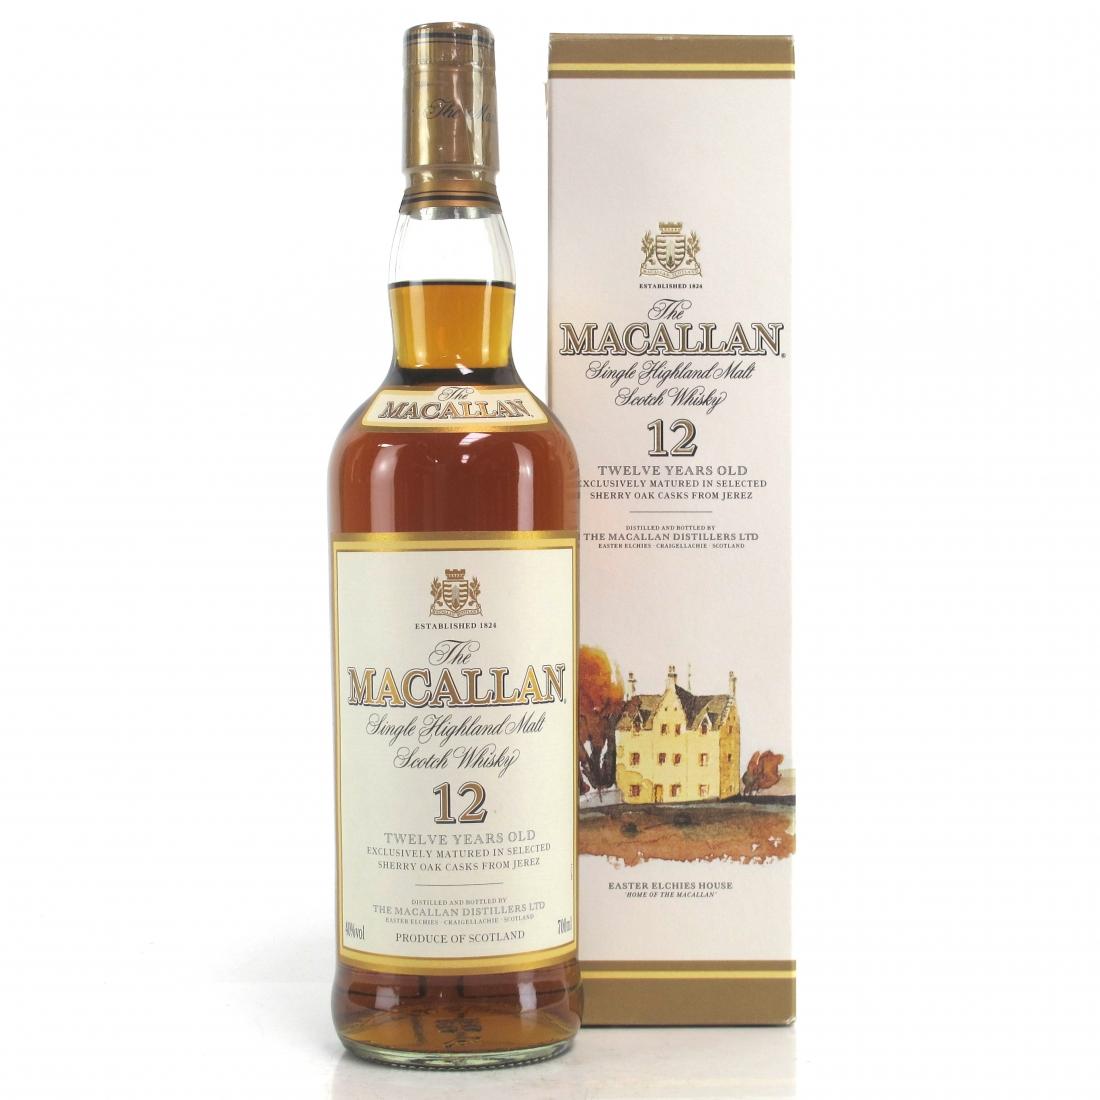 Macallan 12 Year Old